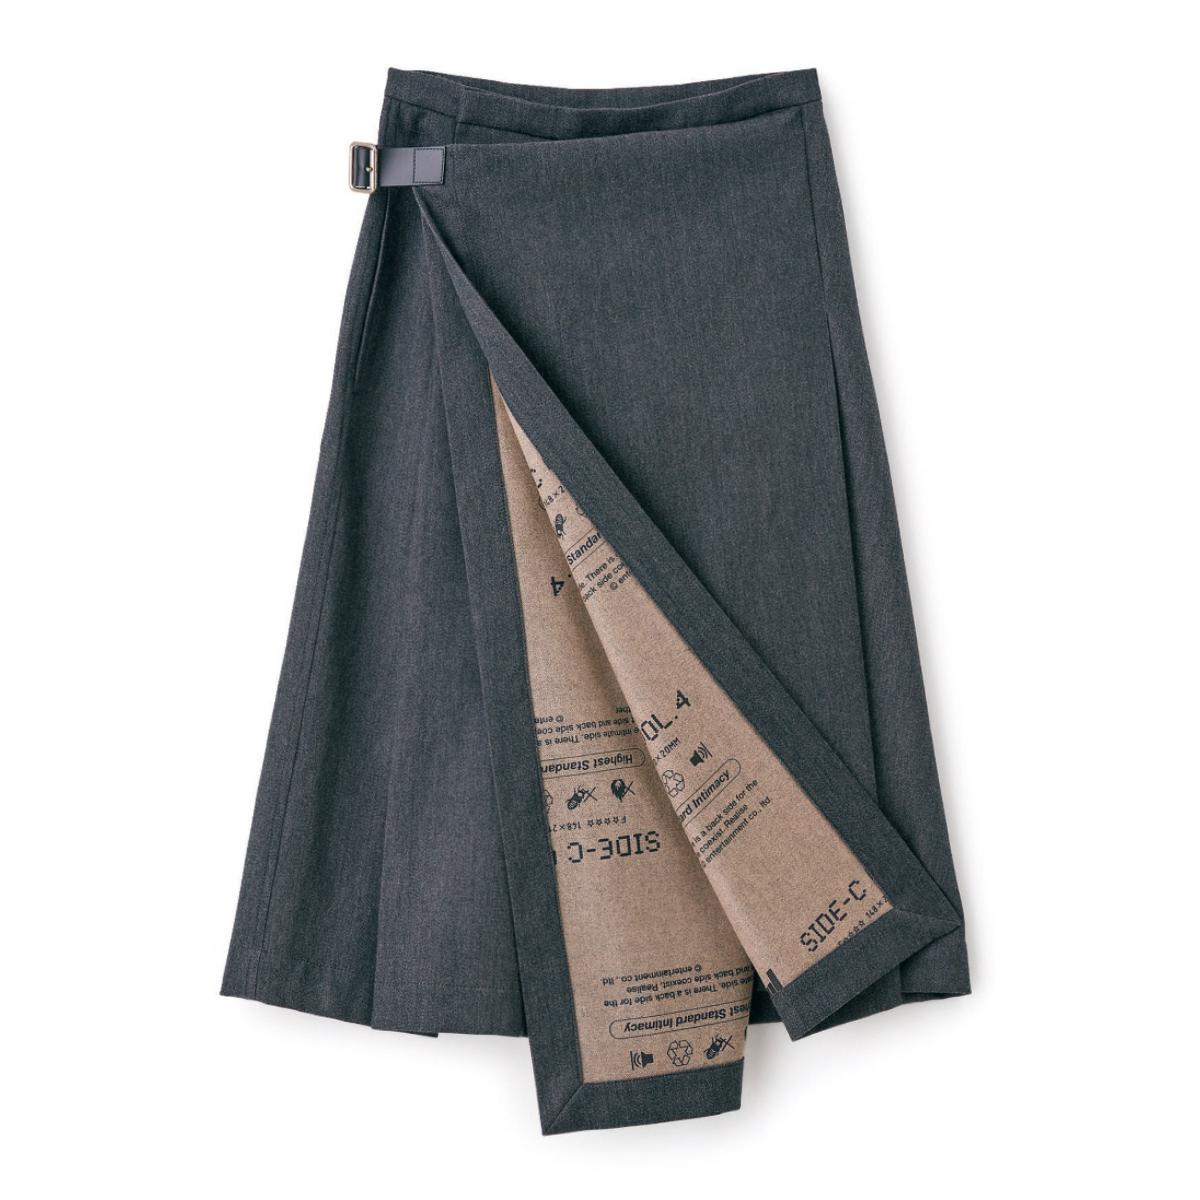 BEAUTIFUL PEOPLEの発熱スカート